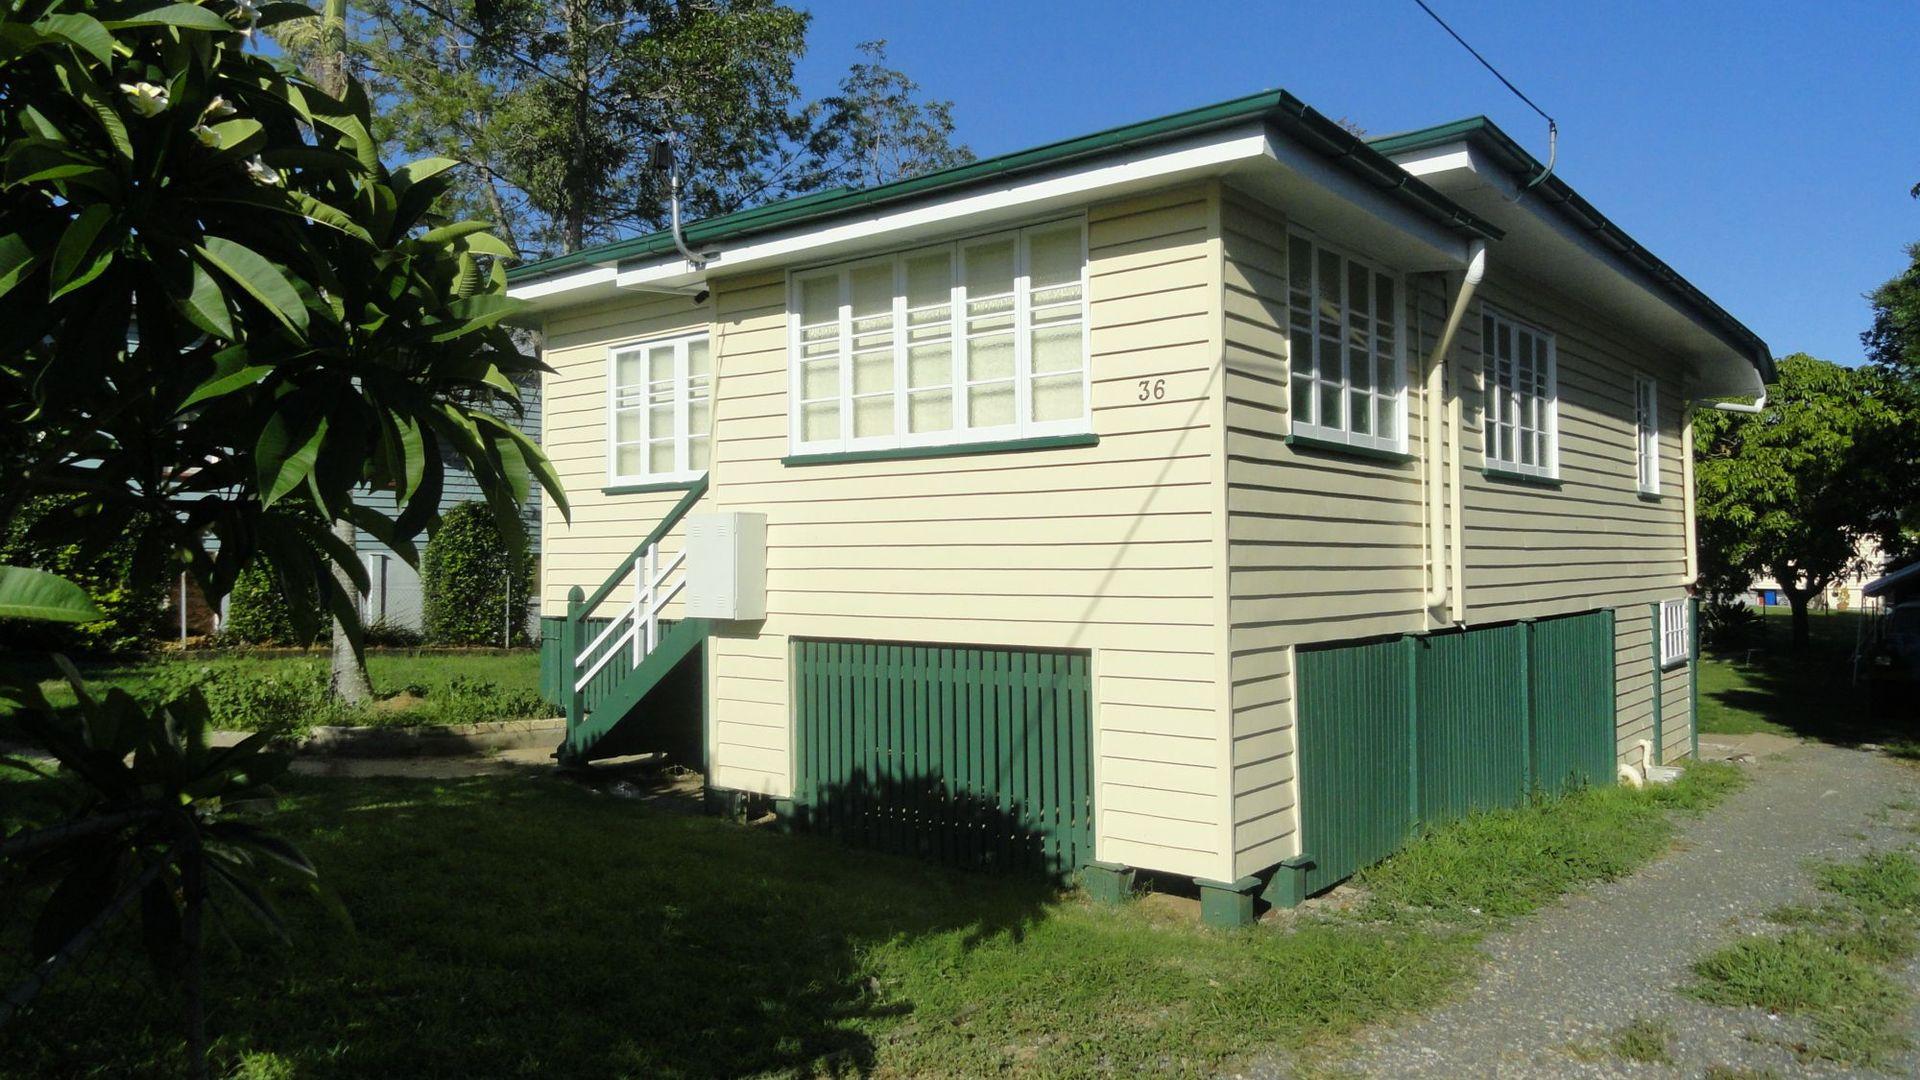 36 THOMPSON Street, Silkstone QLD 4304, Image 1